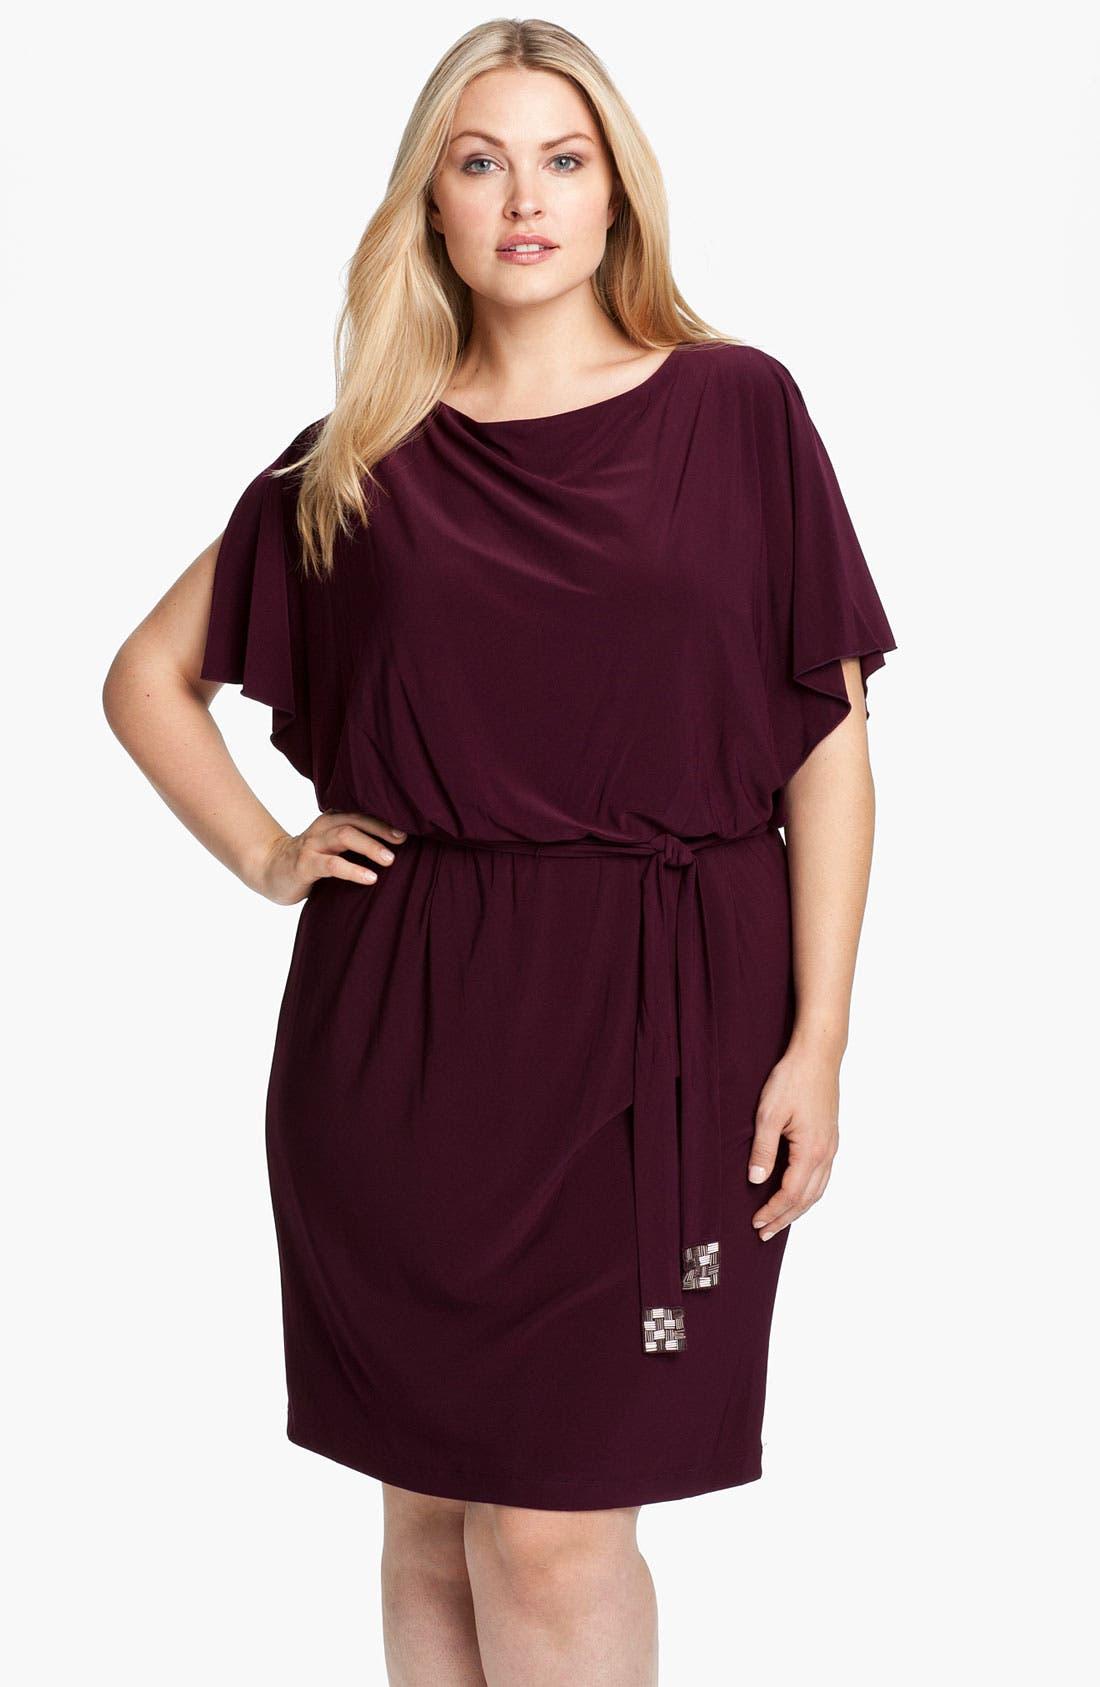 Alternate Image 1 Selected - Eliza J Flutter Sleeve Blouson Dress (Plus)